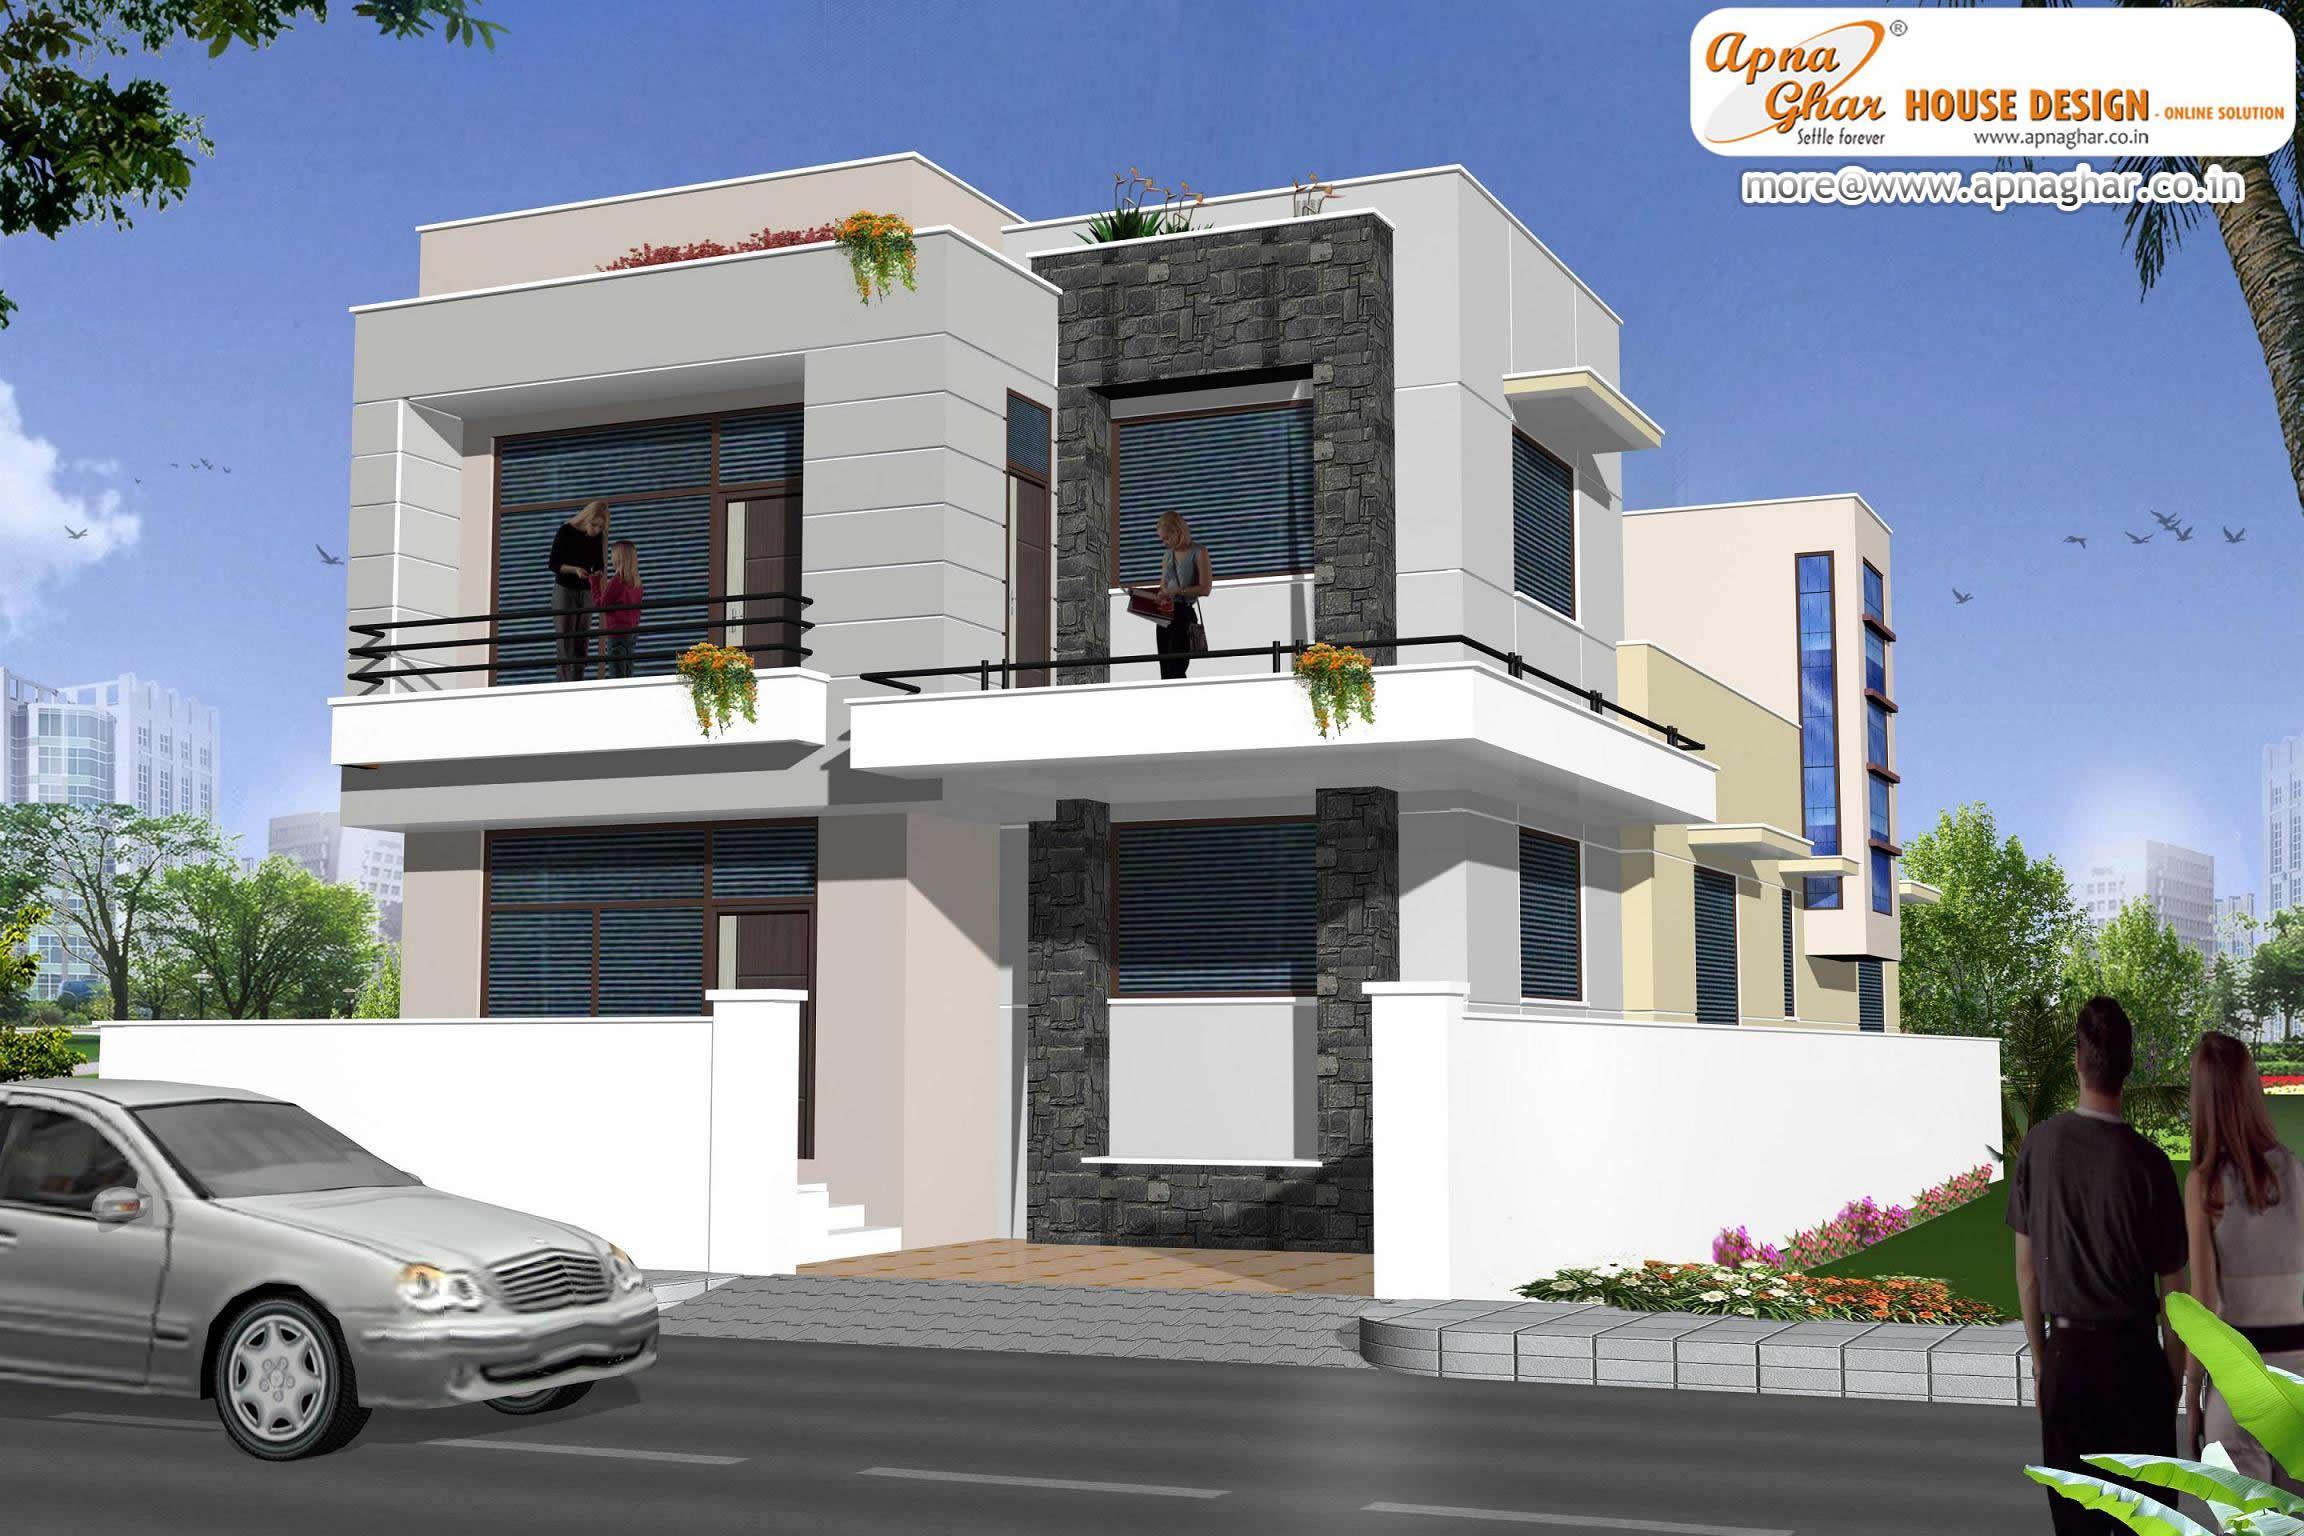 Apna ghar house design joy studio design gallery best for Design duplex house architecture india